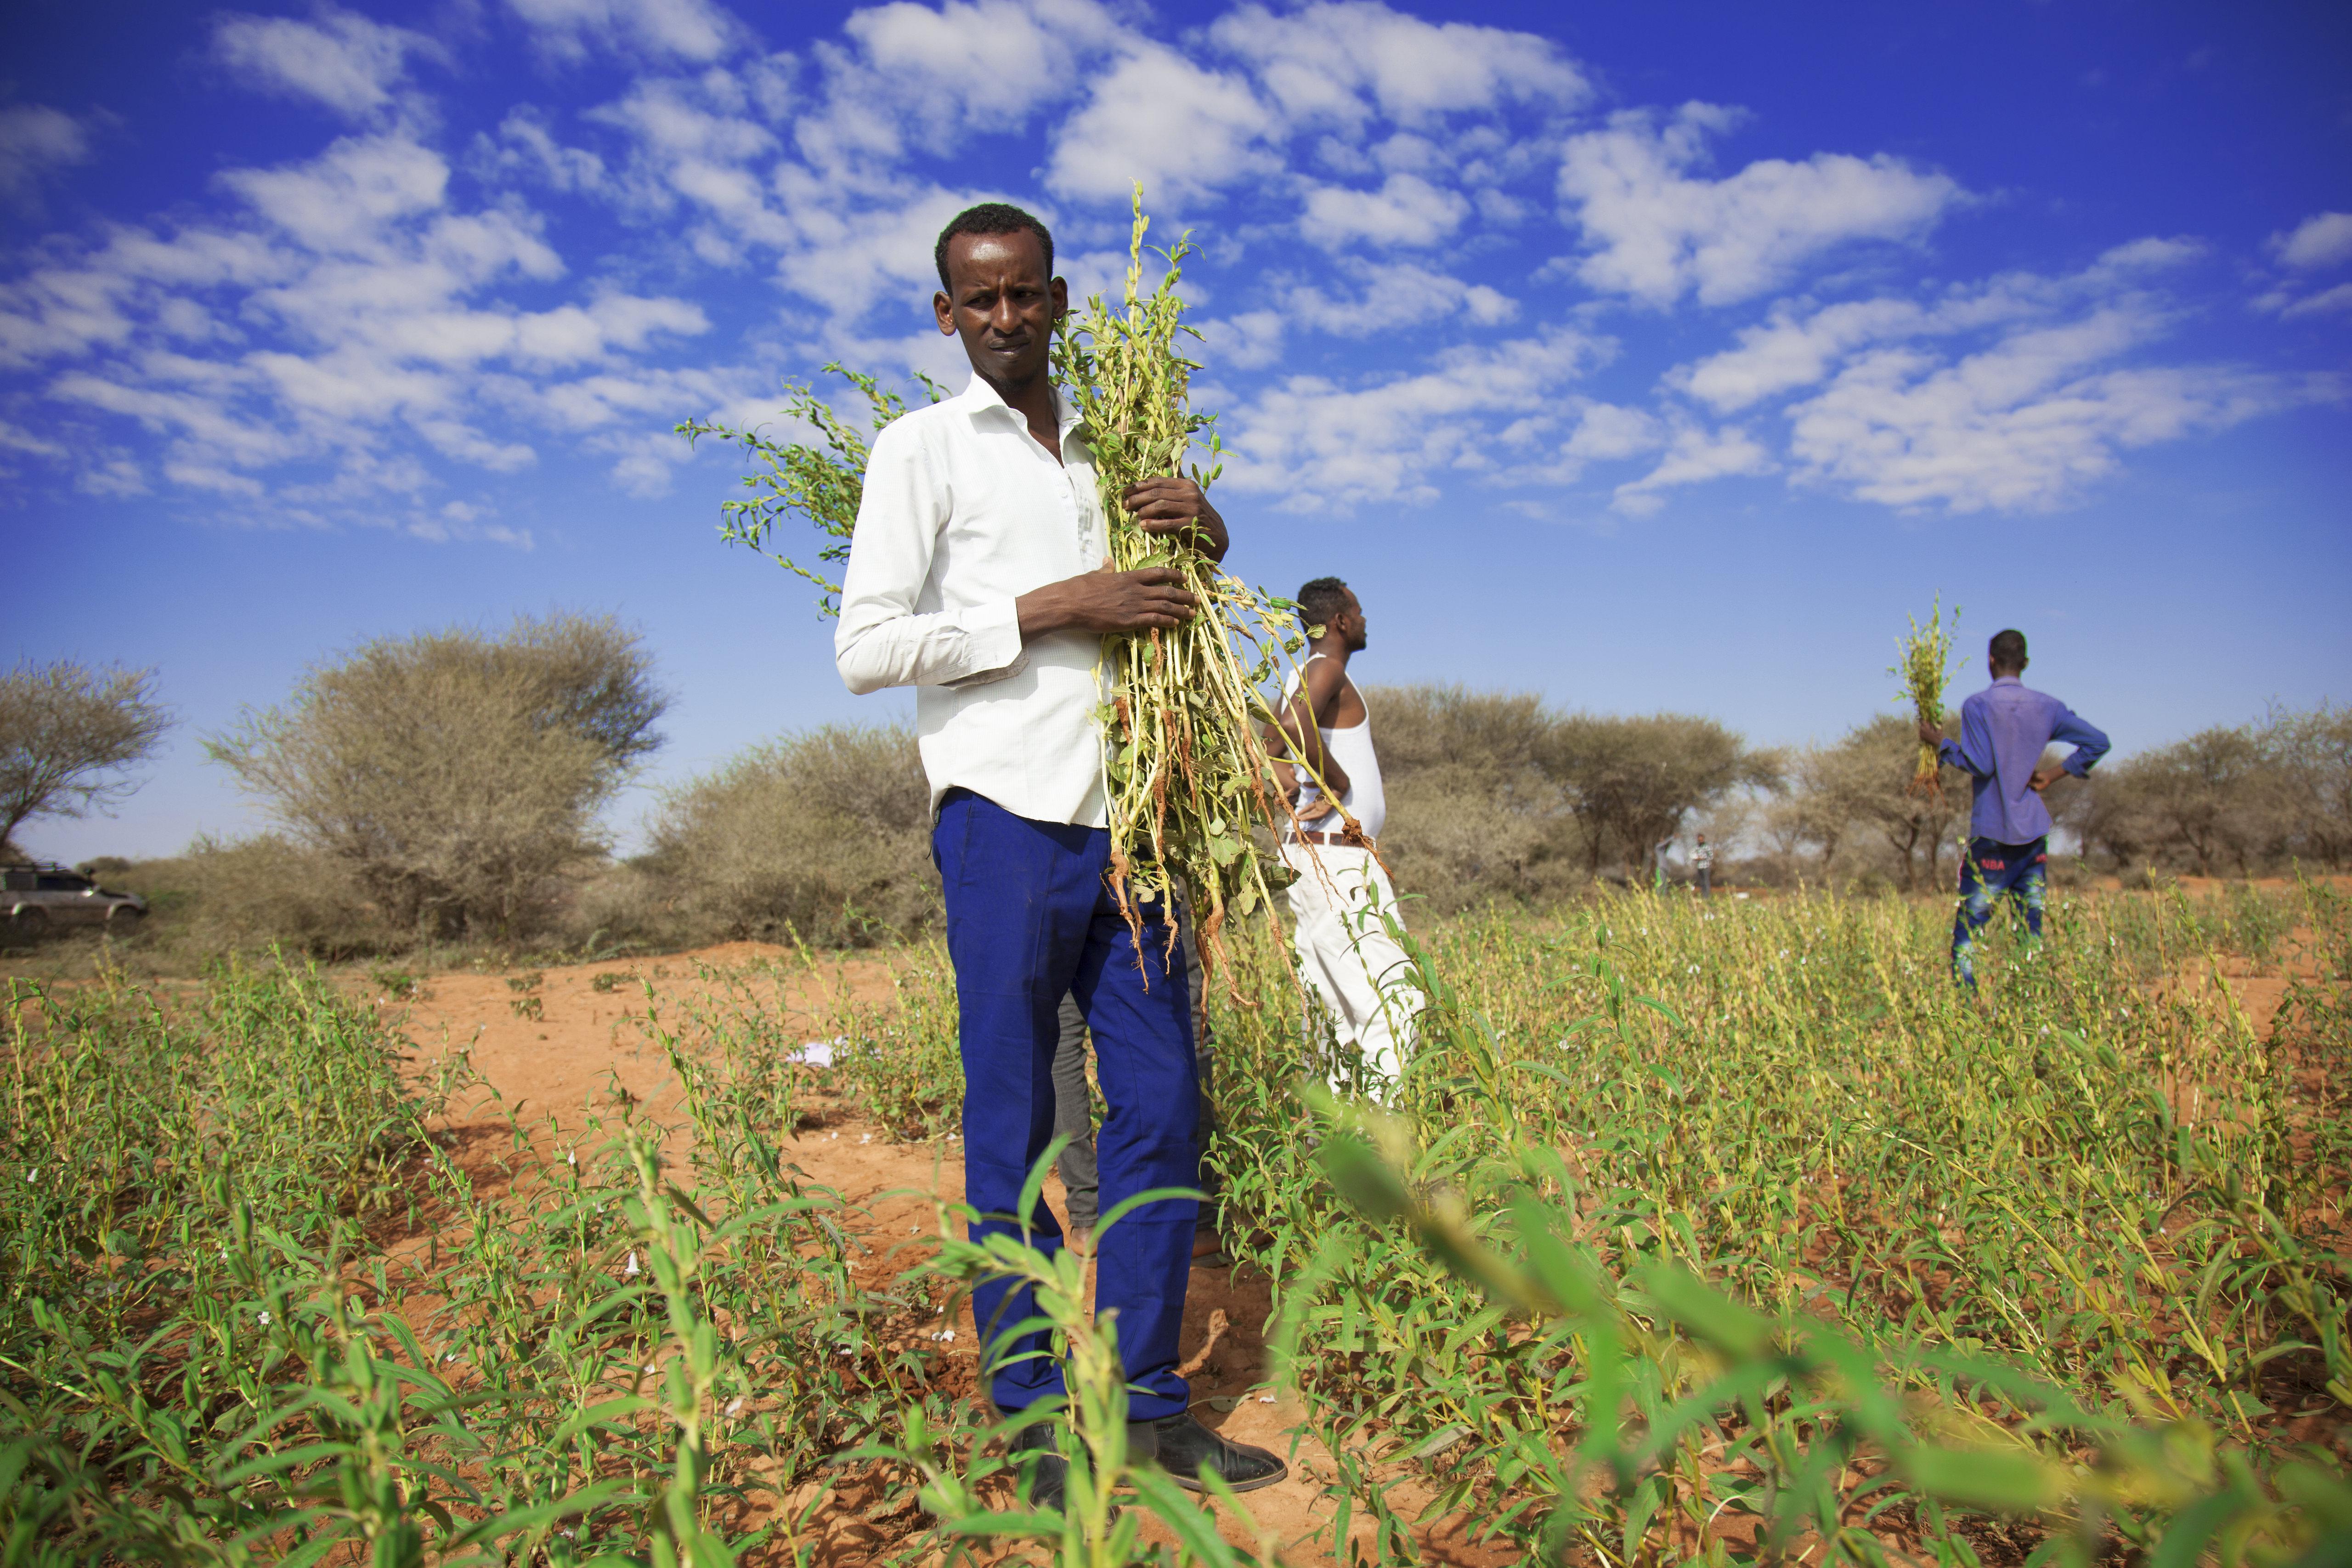 Somalia | Strengthening the resilience of livelihoods in Somaliland